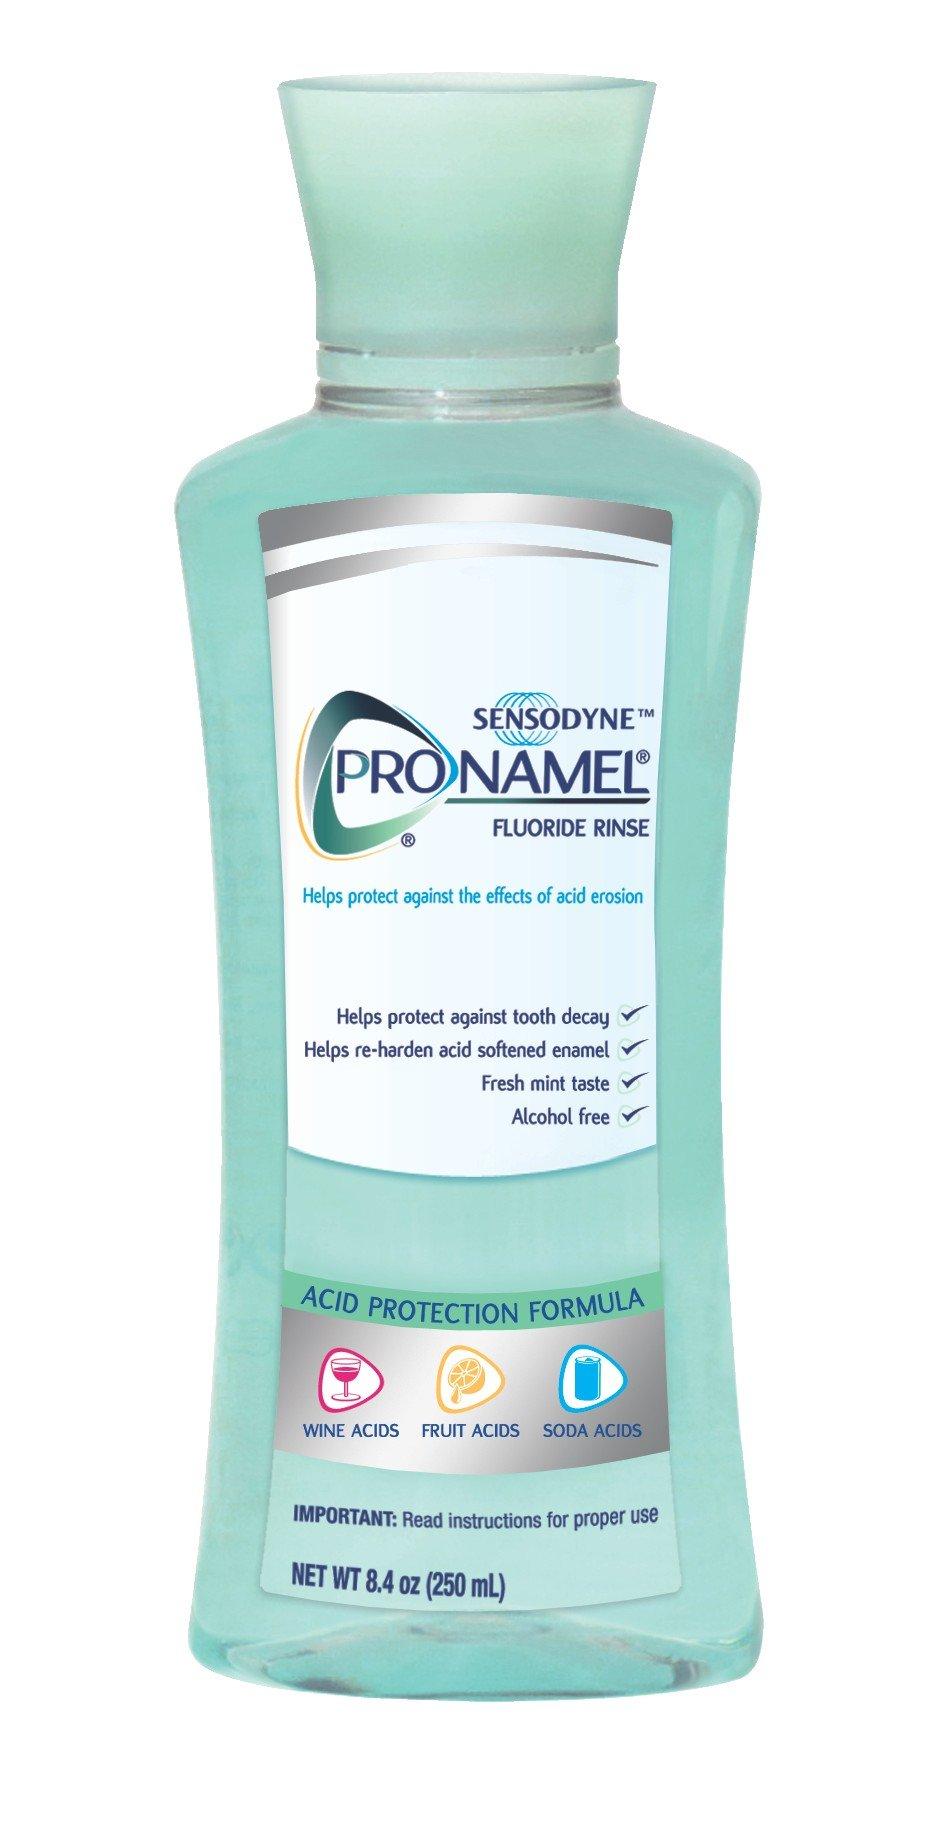 Sensodyne Pronamel Mouthwash, 8.4 Ounce